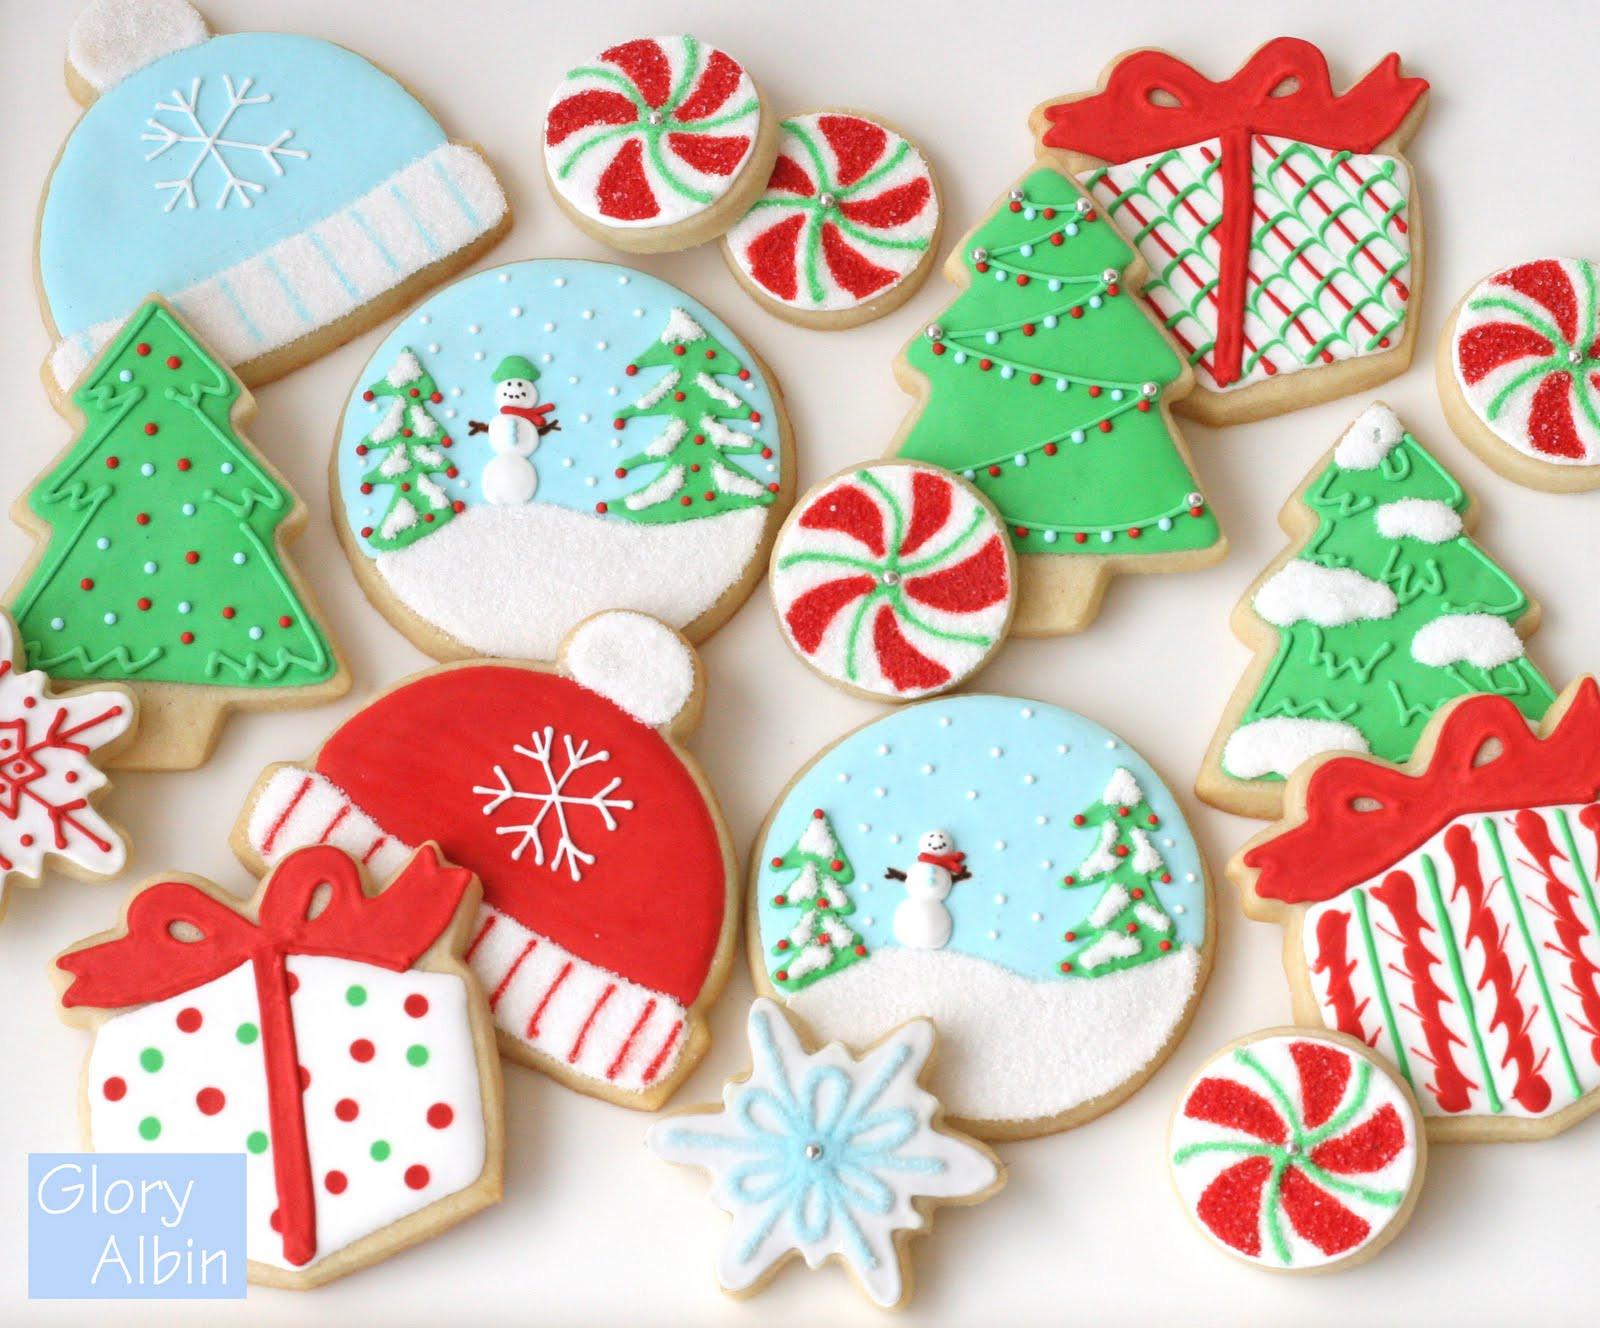 Christmas Sugar Cookies With Royal Icing  Decorating Sugar Cookies with Royal Icing – Glorious Treats